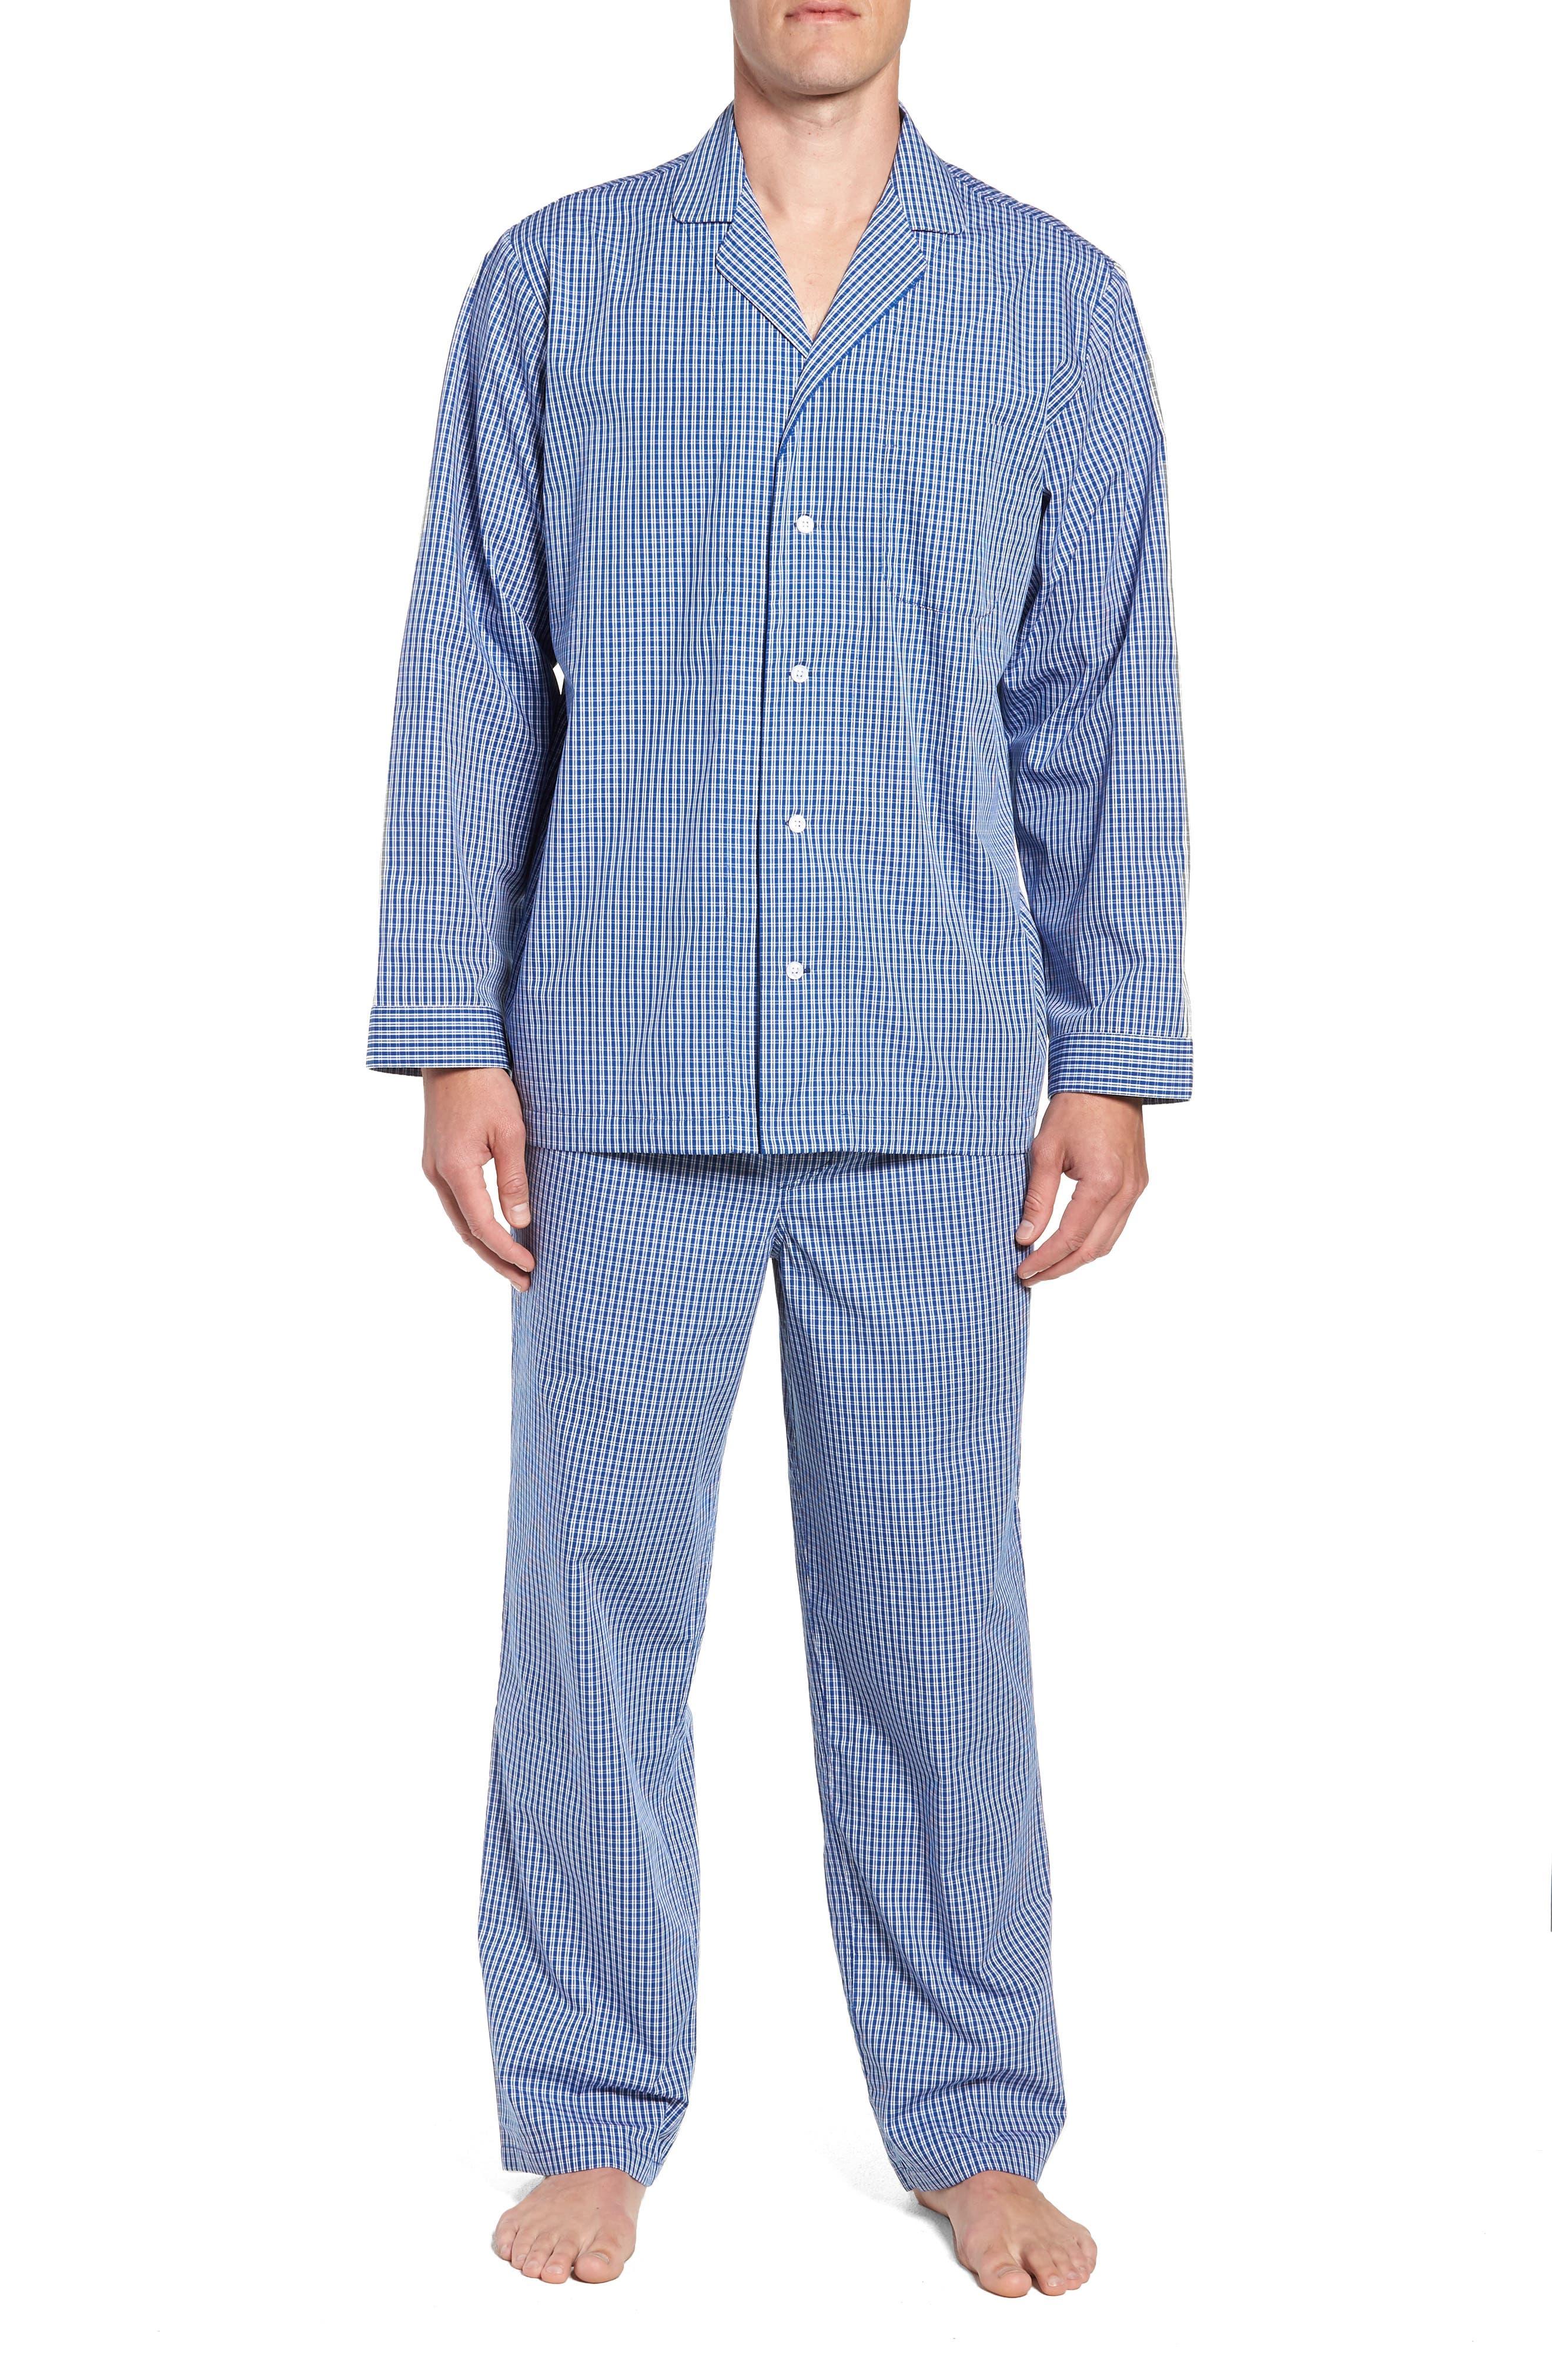 NORDSTROM MEN'S SHOP Poplin Pajama Set, Main, color, 404